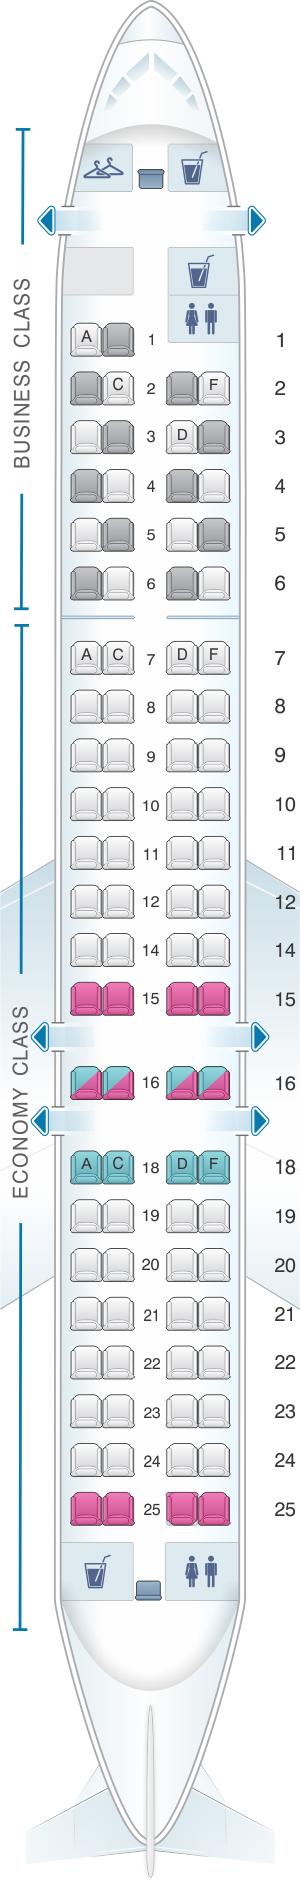 Seat map for Lufthansa Bombardier Canadair CRJ 900